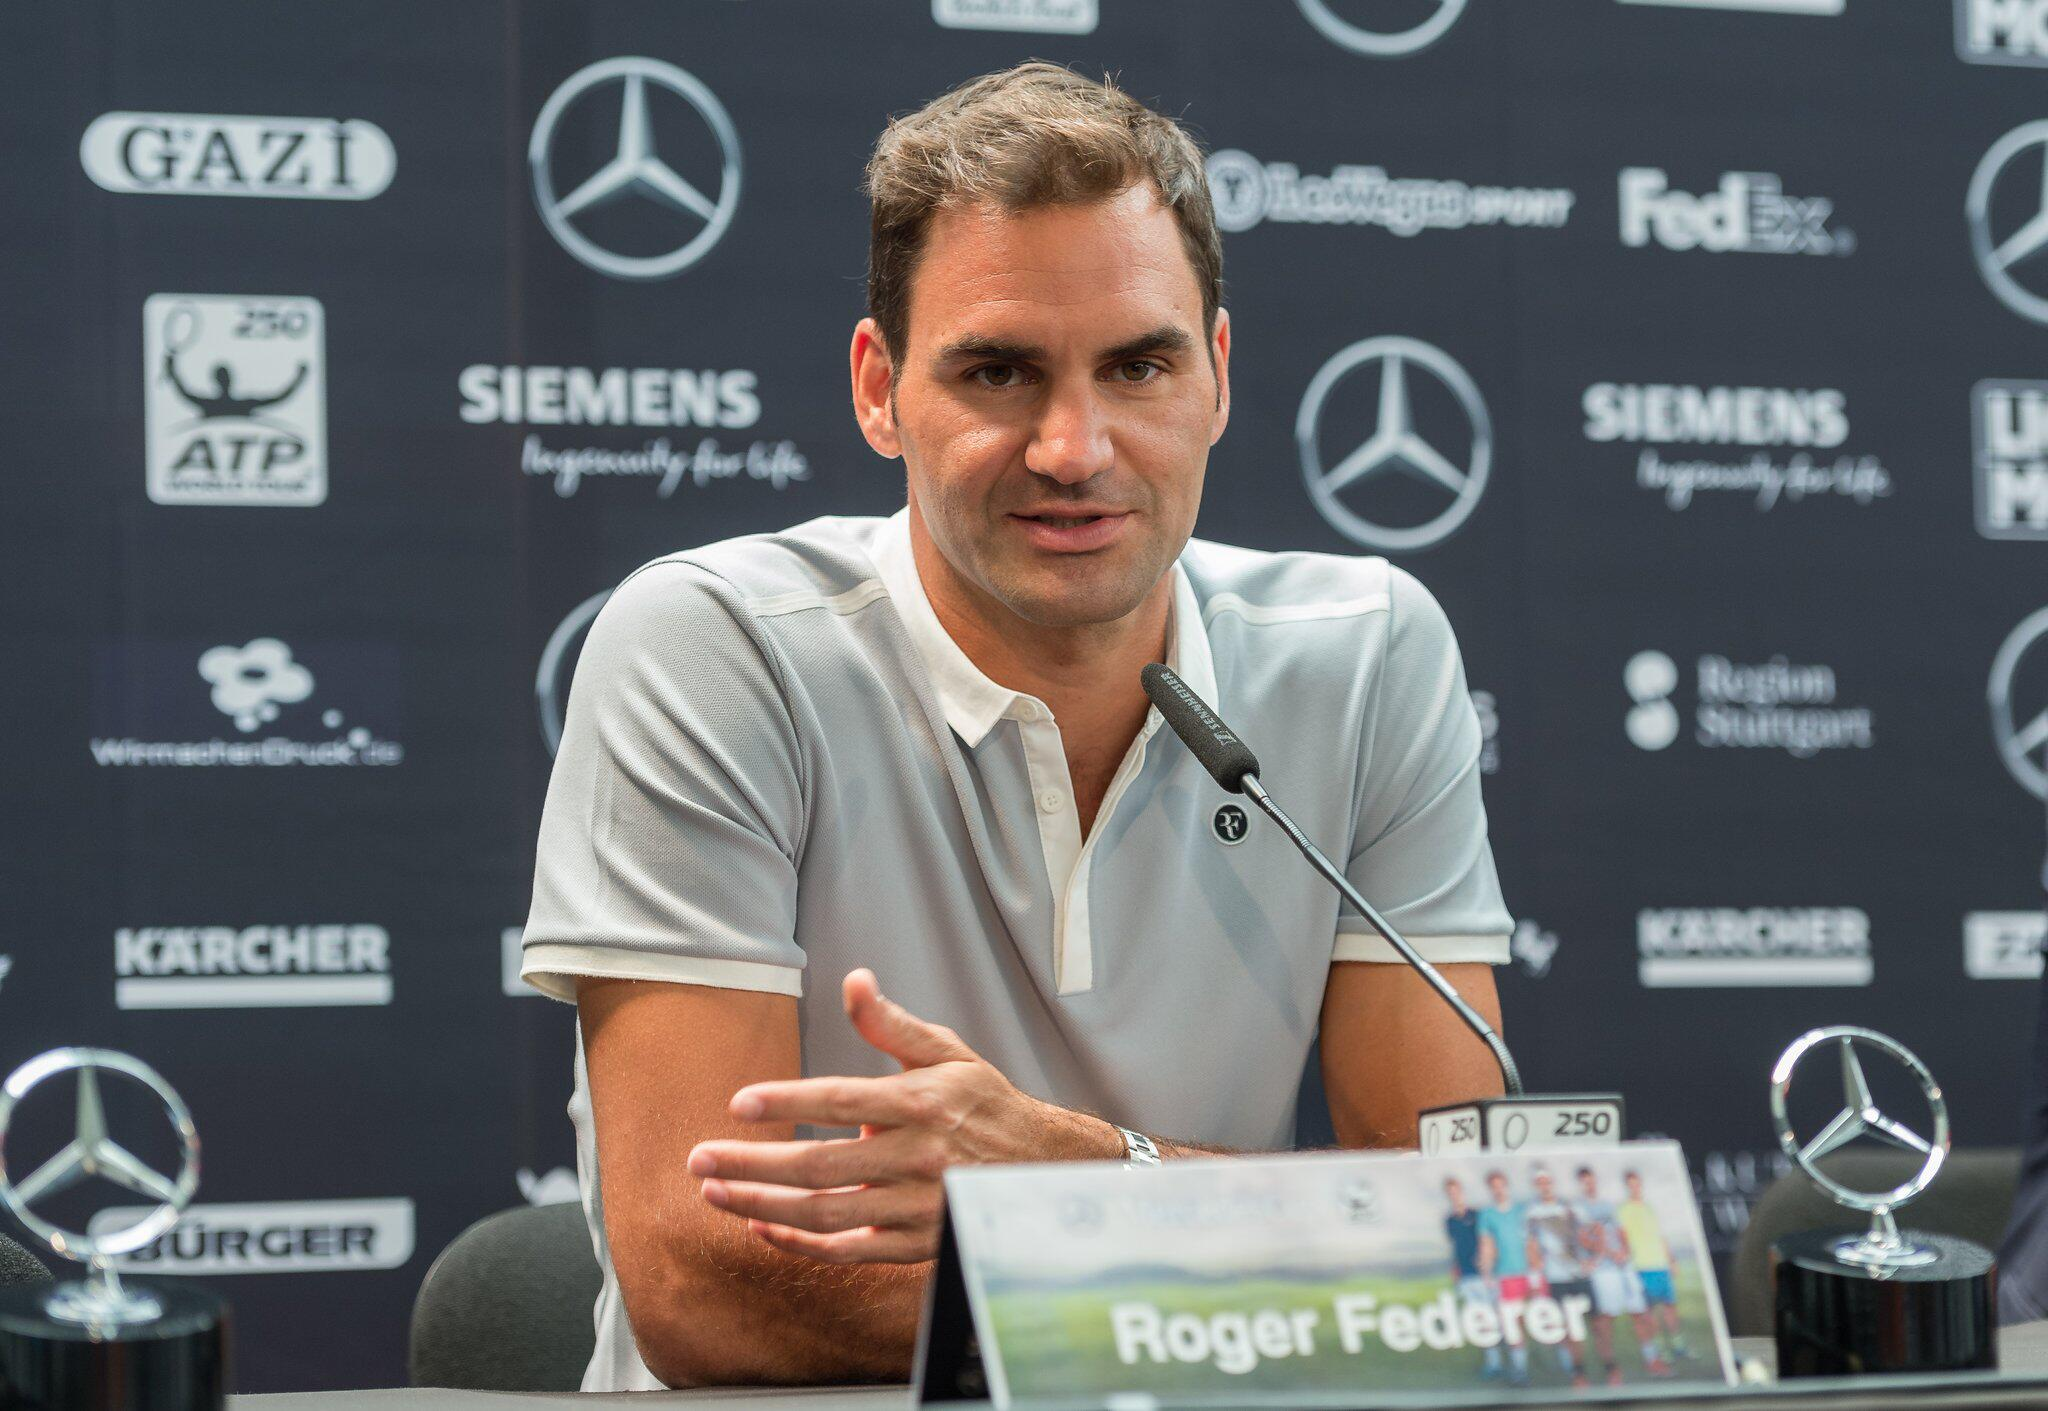 Bild zu Roger Federer, Pressekonferenz, ATP Mercedes Cup, Stuttgart